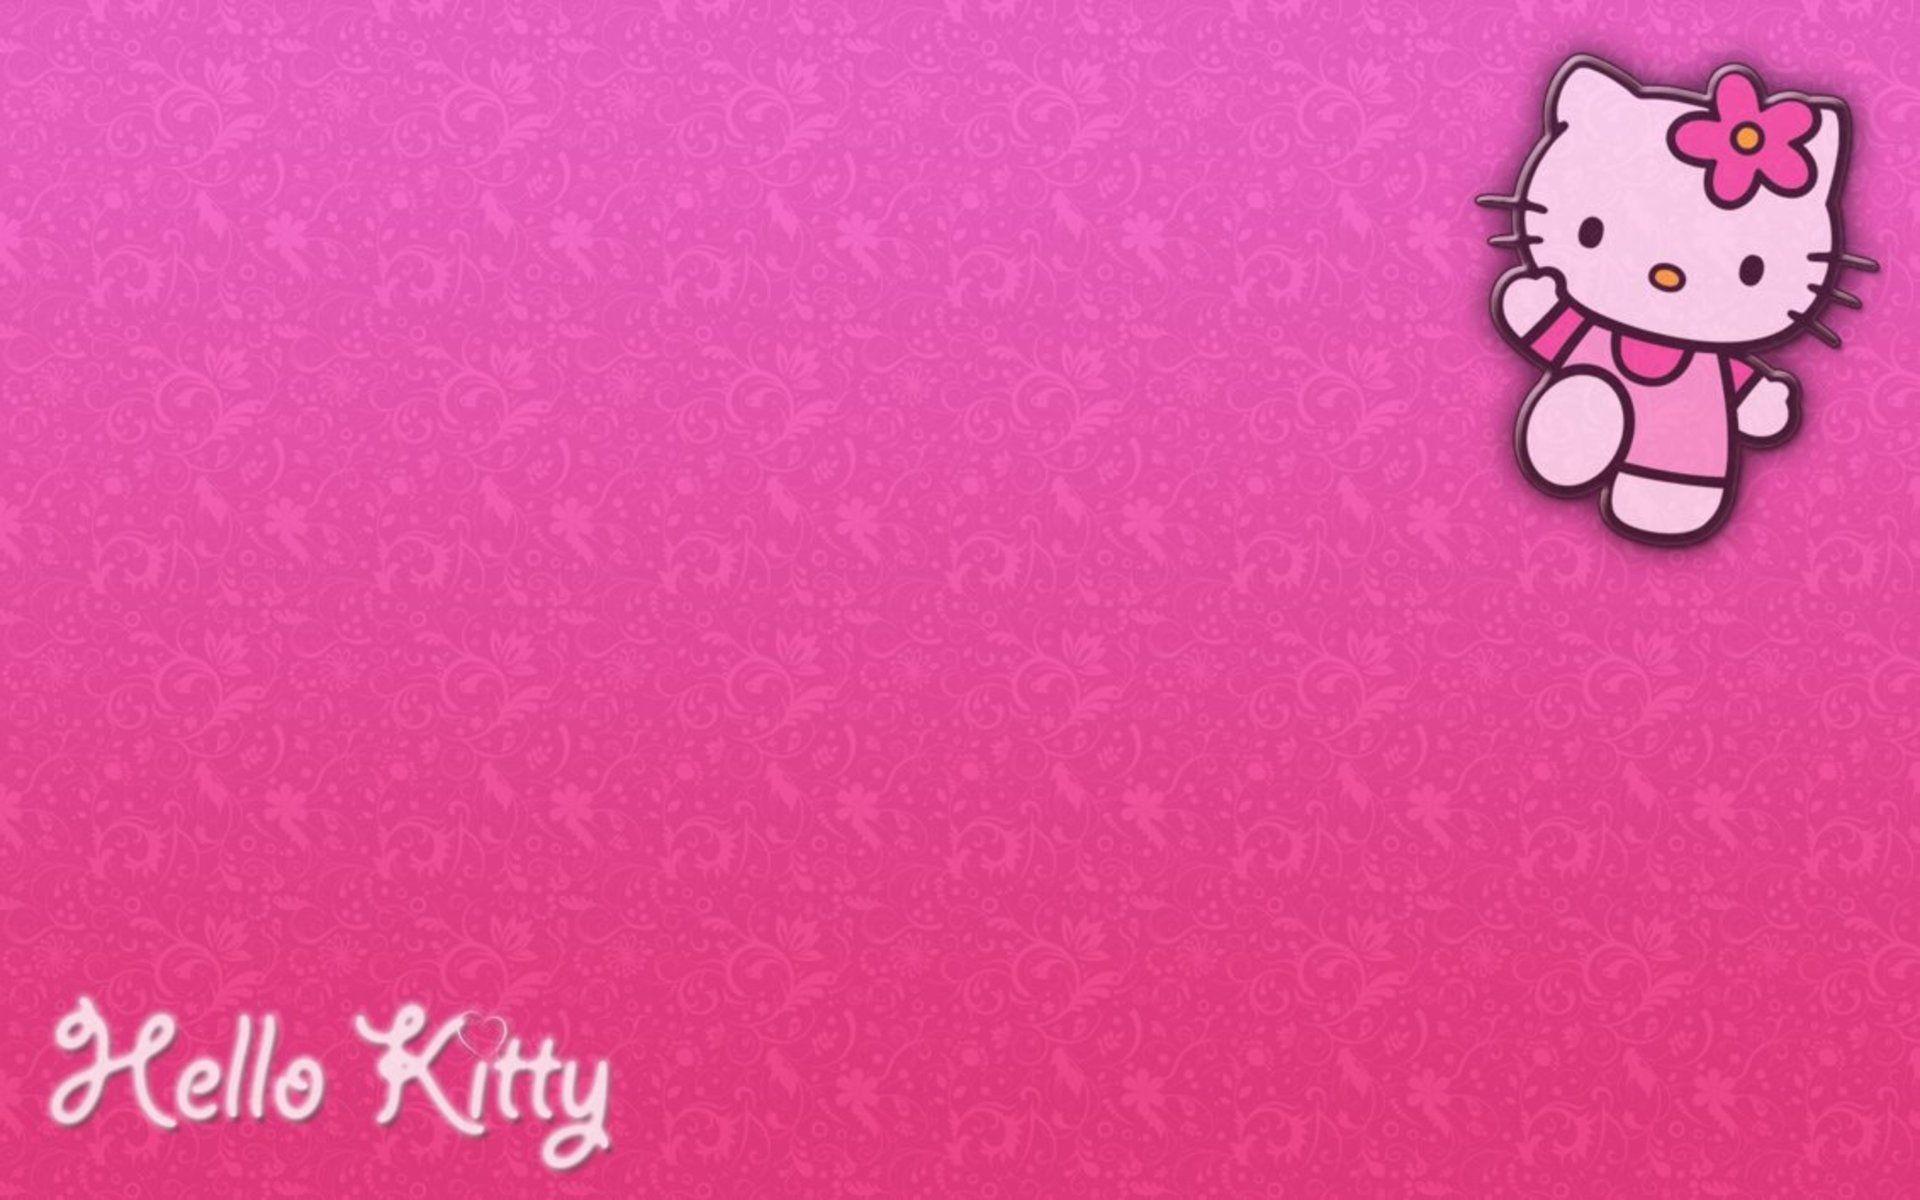 hello kitty birthday wallpapers top